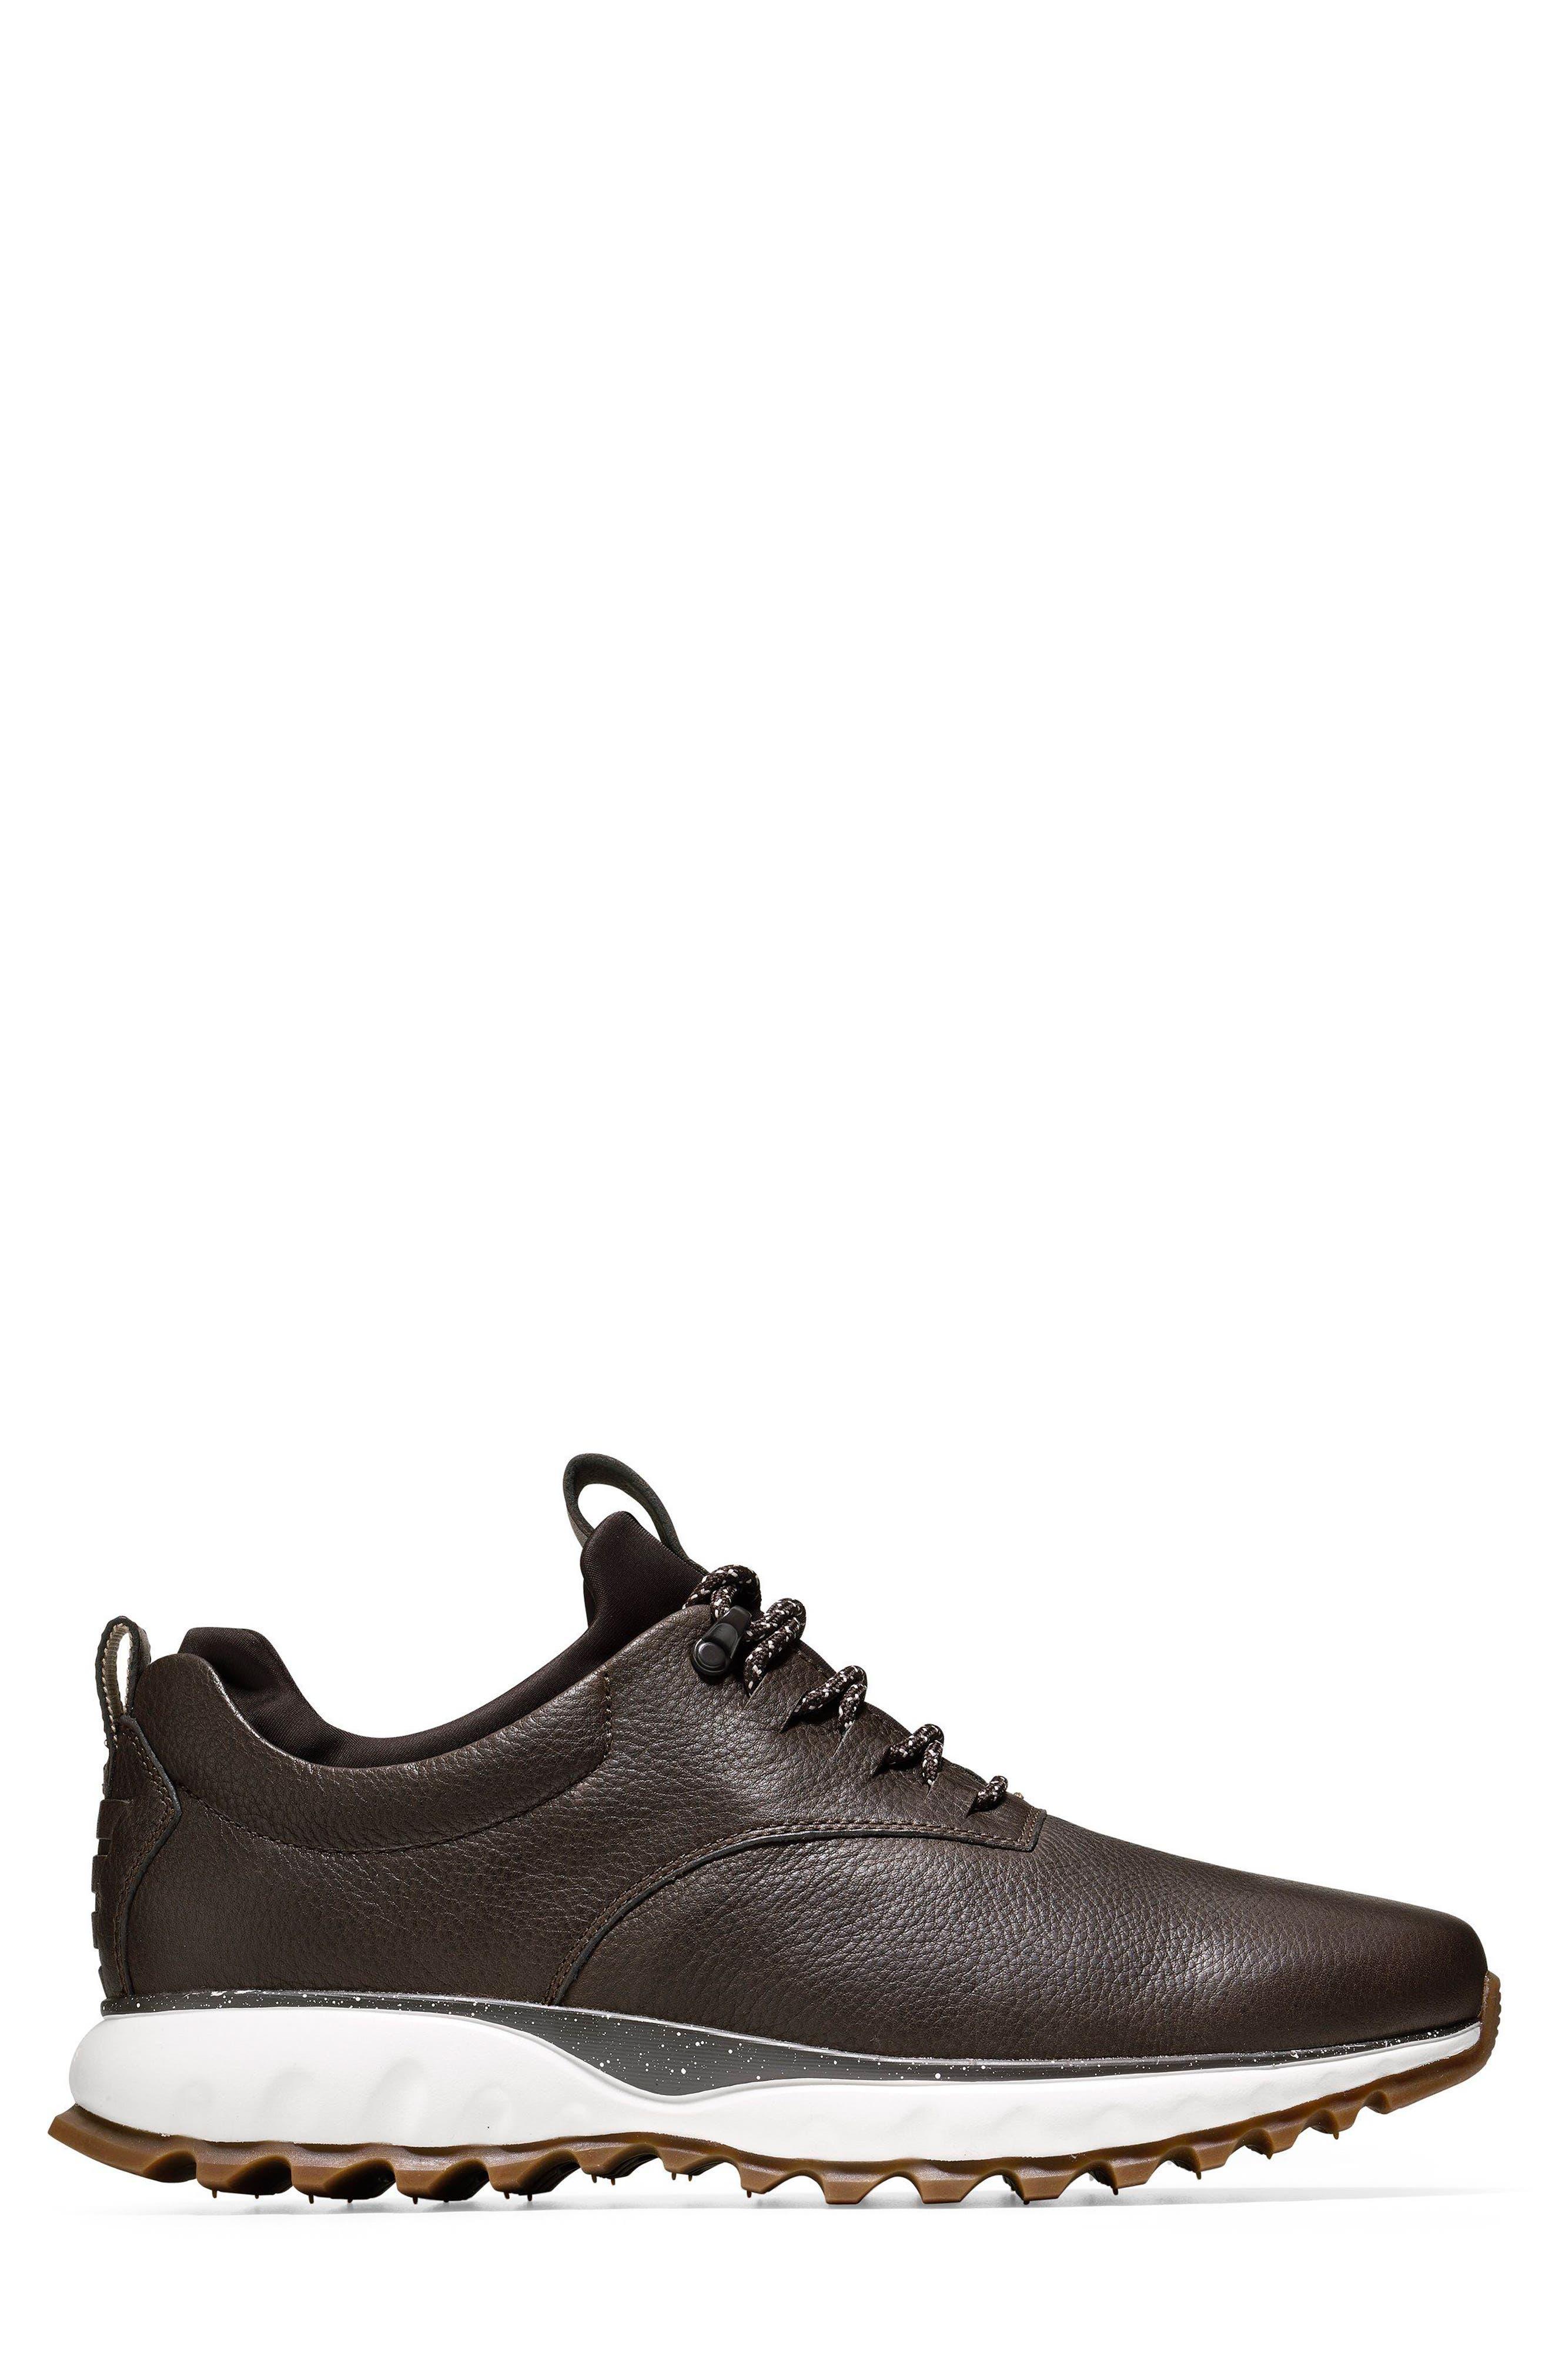 GrandExpløre All Terrain Waterproof Sneaker,                             Alternate thumbnail 3, color,                             200